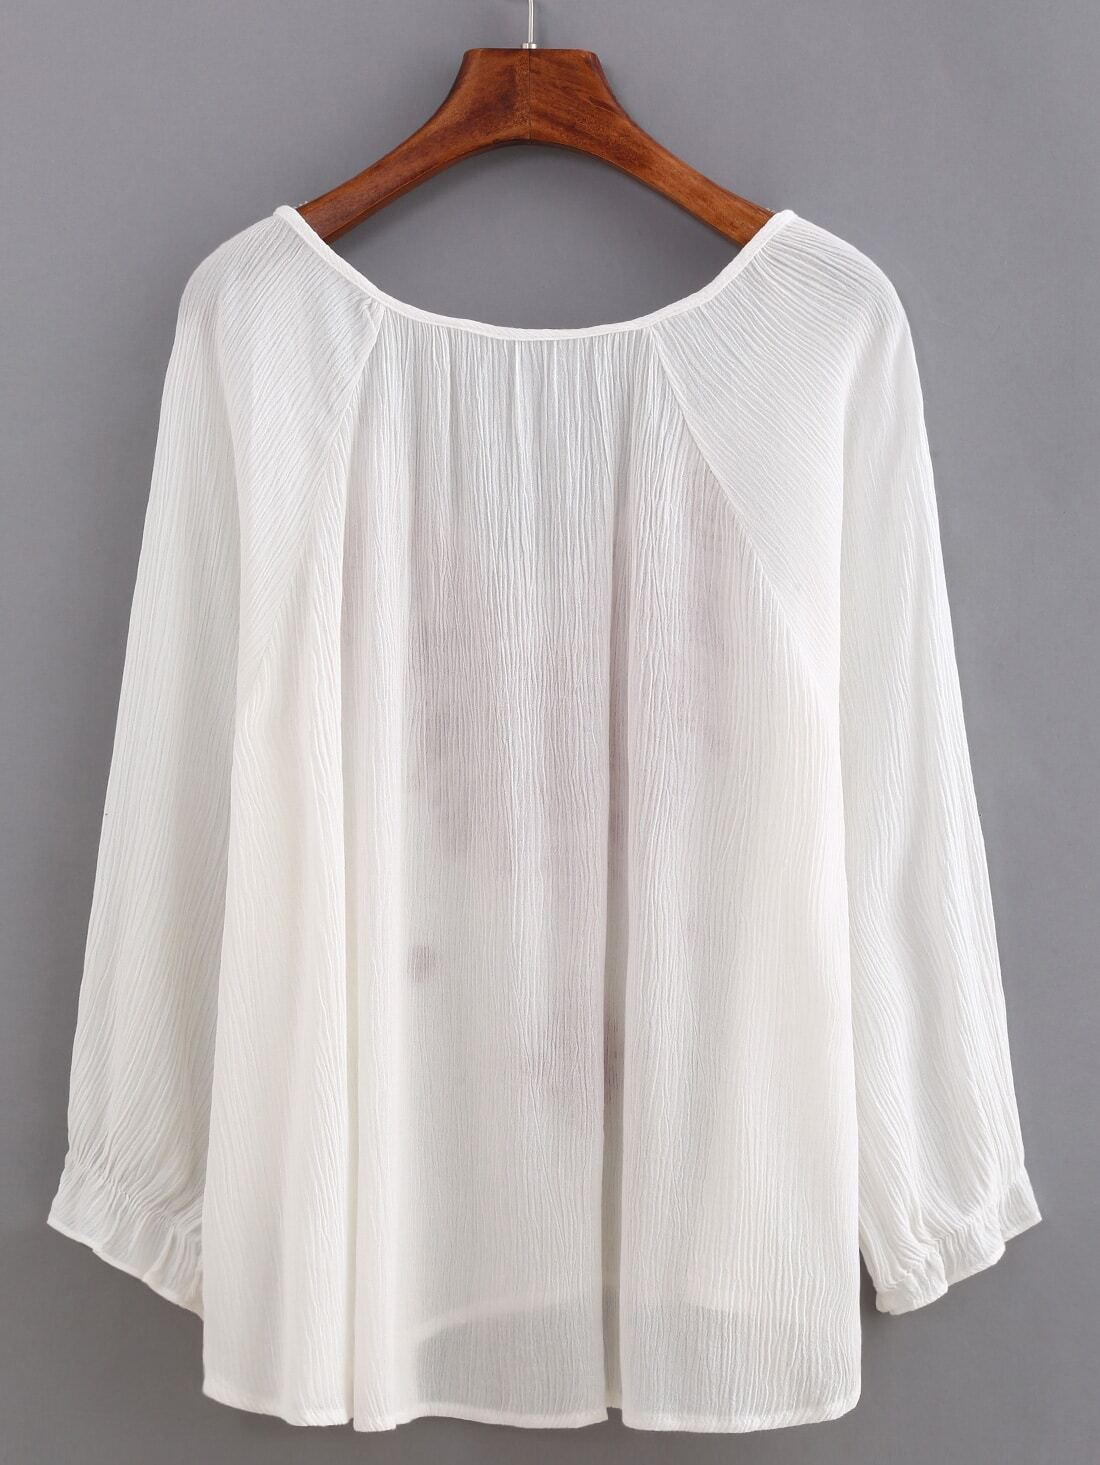 Embroidery Tassel-Tie Neck Blouse -SheIn(Sheinside)